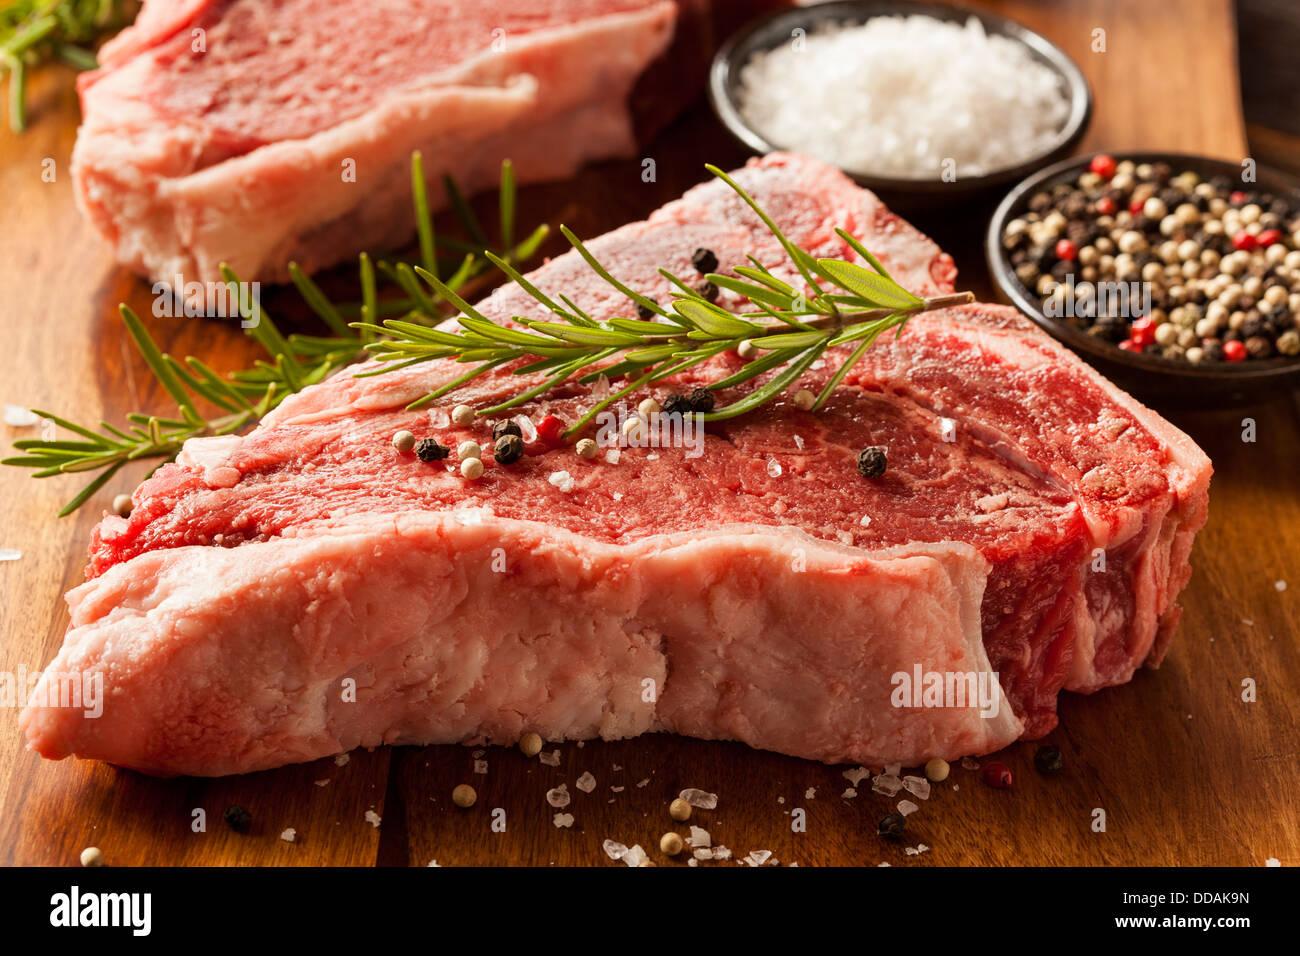 Thick Raw T-Bone Steak with Seasoning and Rosemary - Stock Image